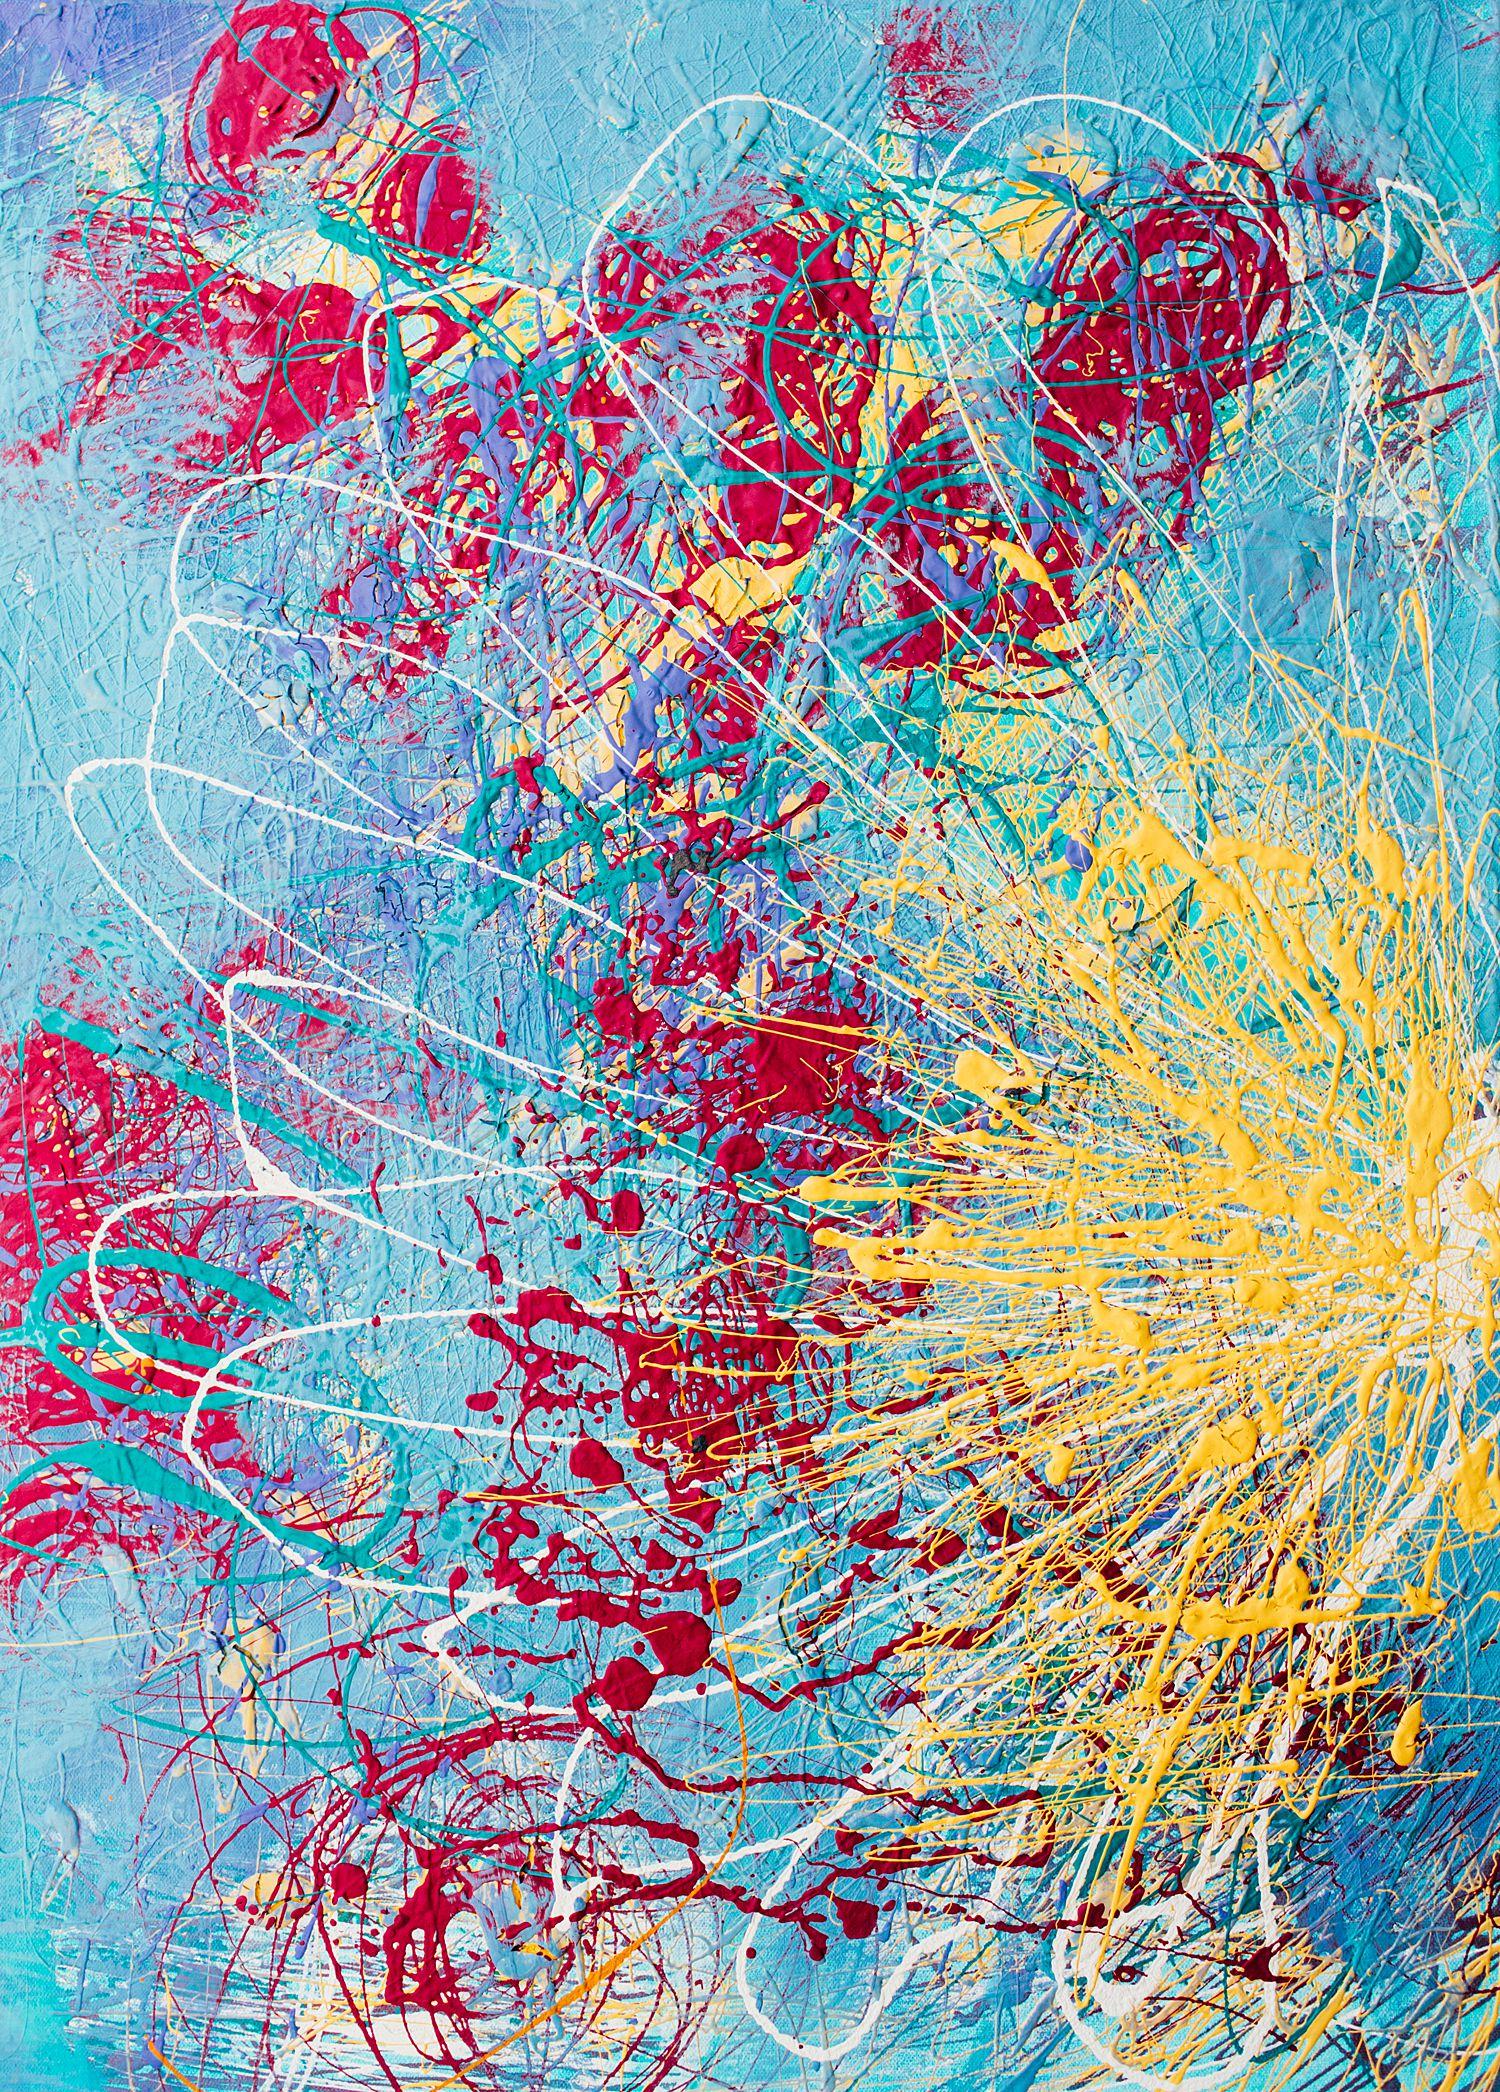 Painting Acrylic & Latex on Canvas (2017)